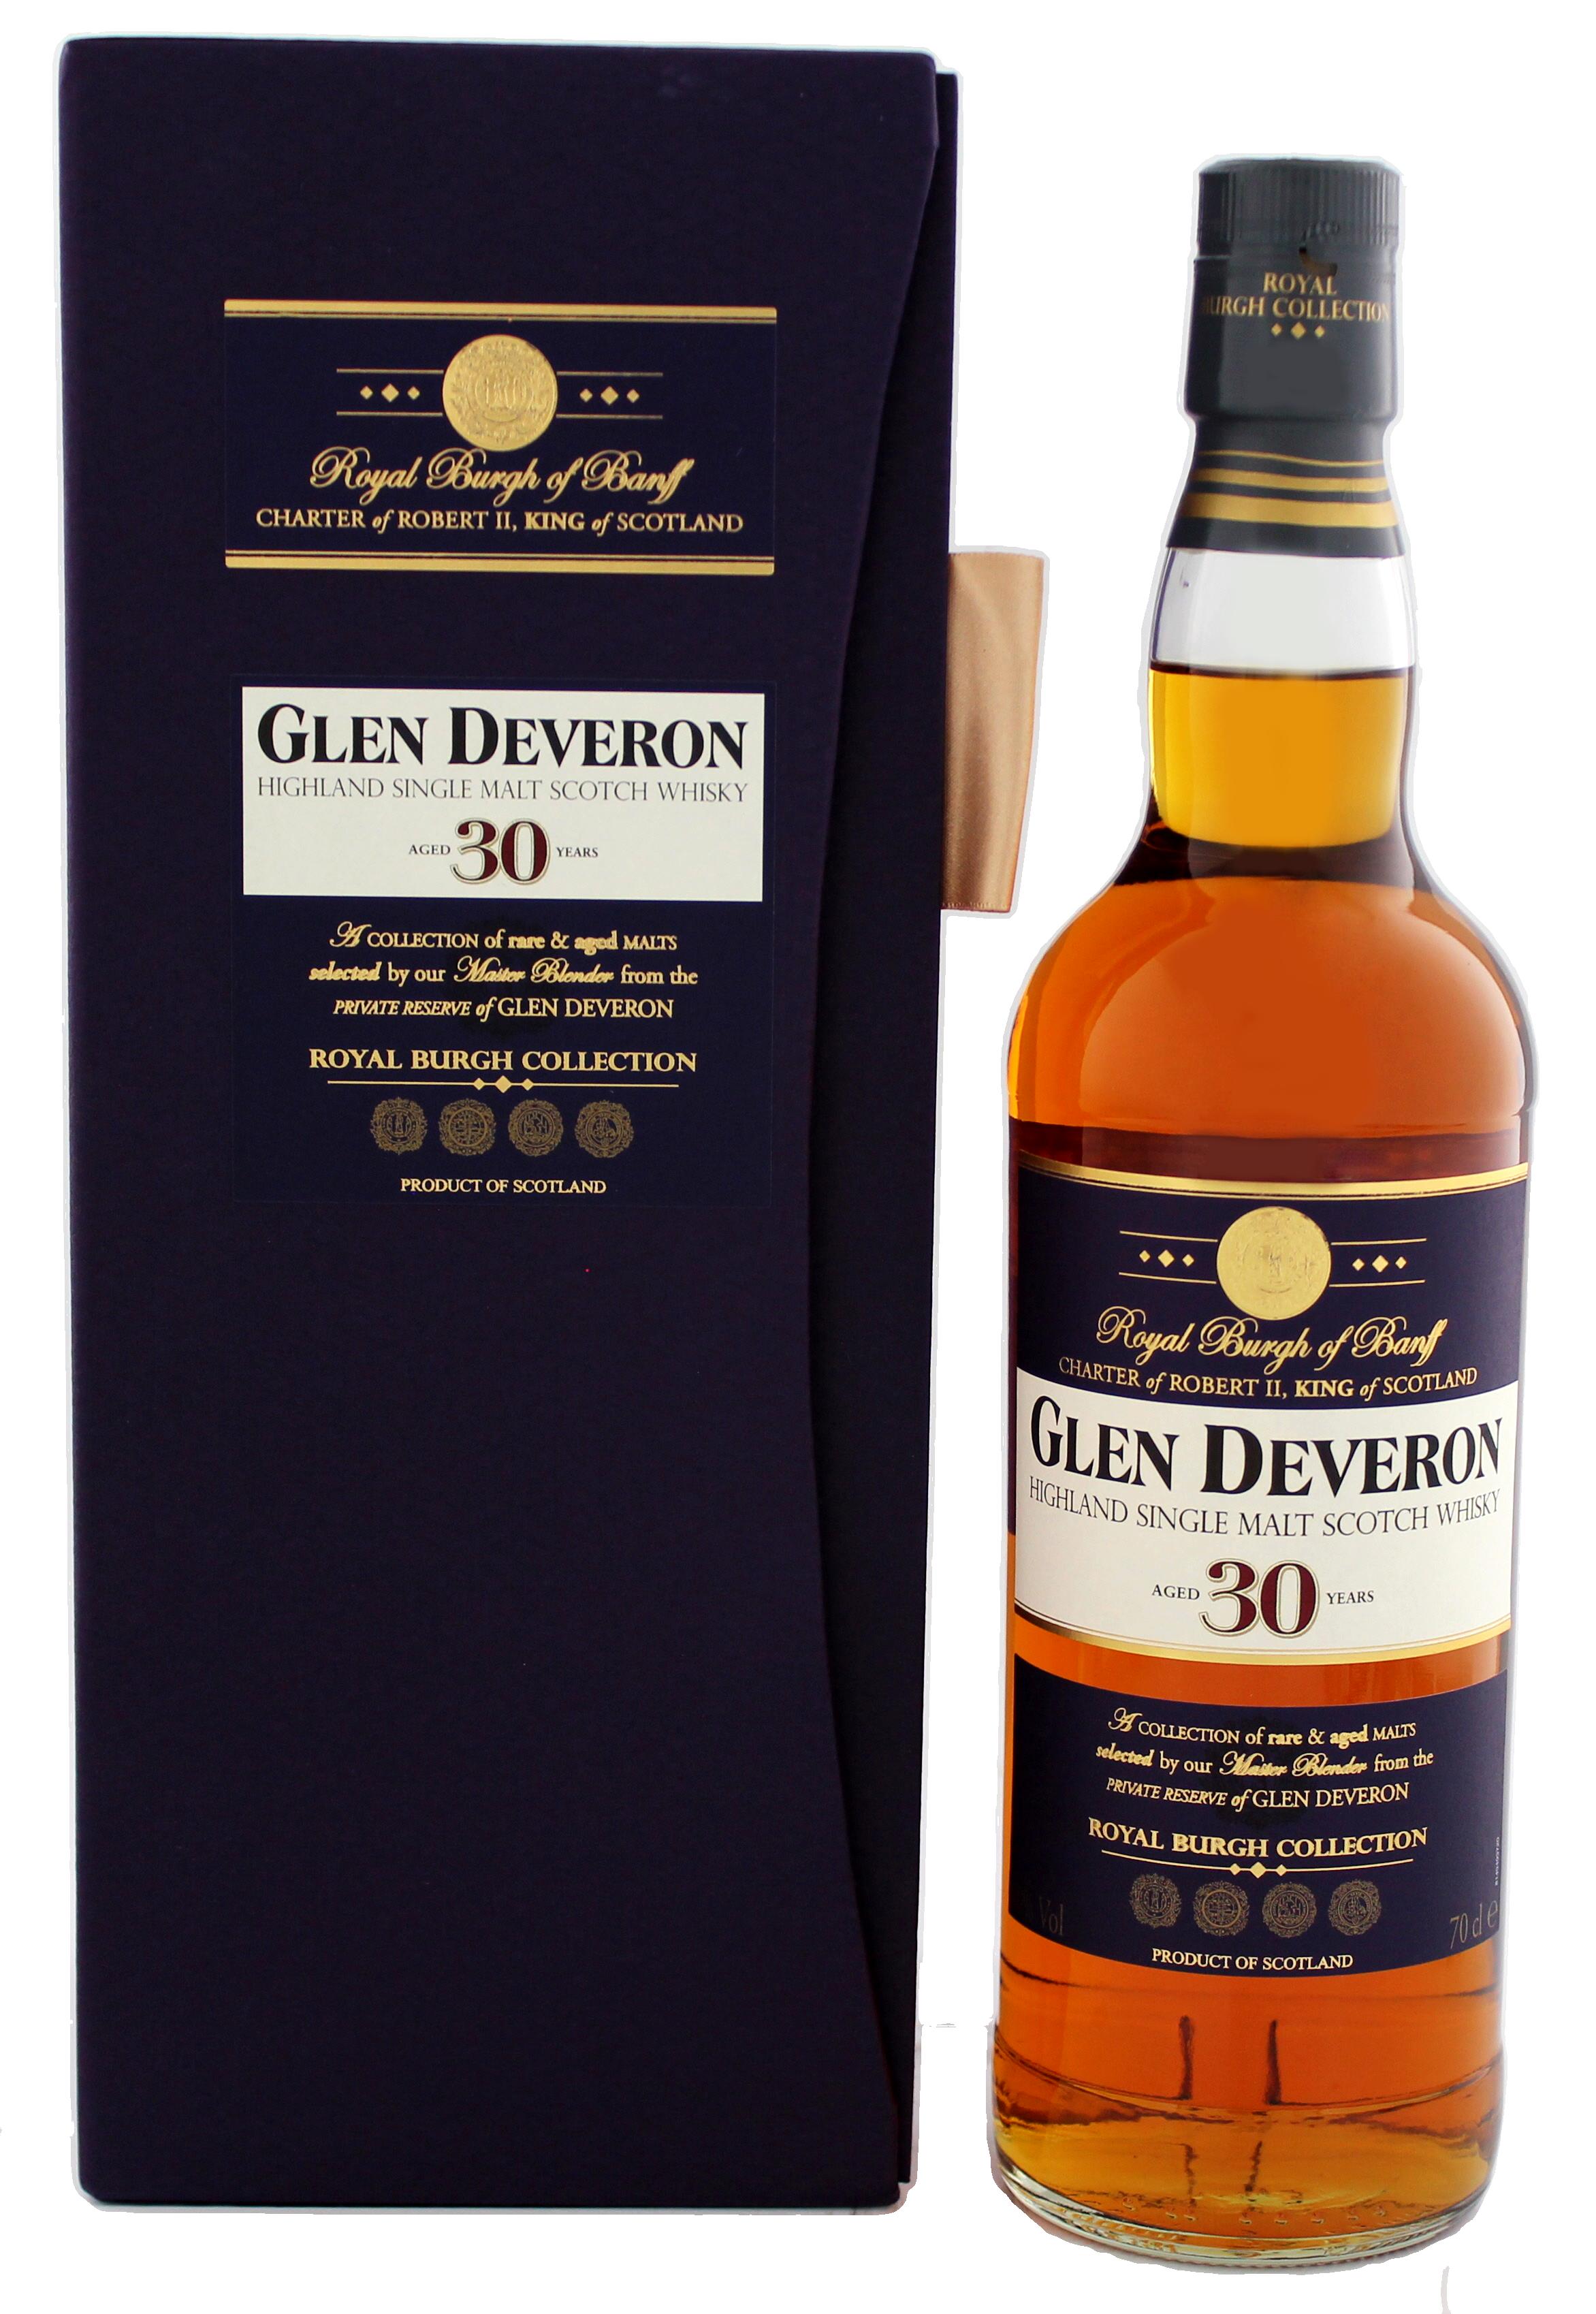 glen deveron malt whisky 30 jahre jetzt kaufen whisky online shop. Black Bedroom Furniture Sets. Home Design Ideas